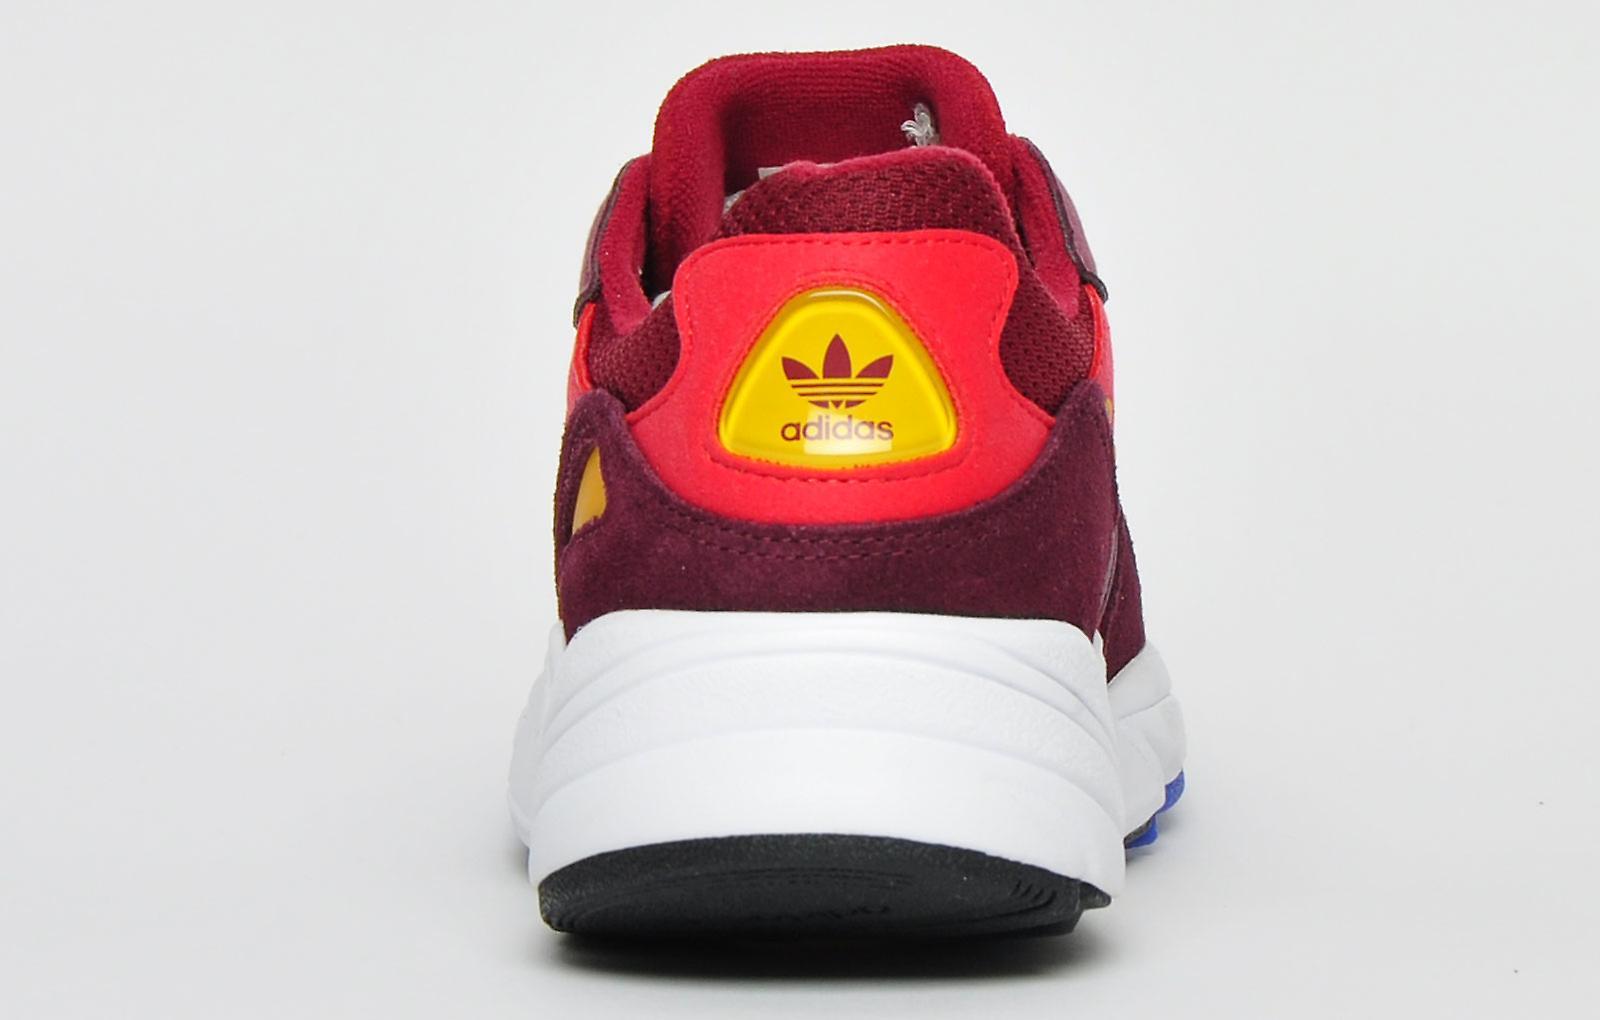 Adidas Originals Yung-96 Junior Burgundy / Maroon Gold